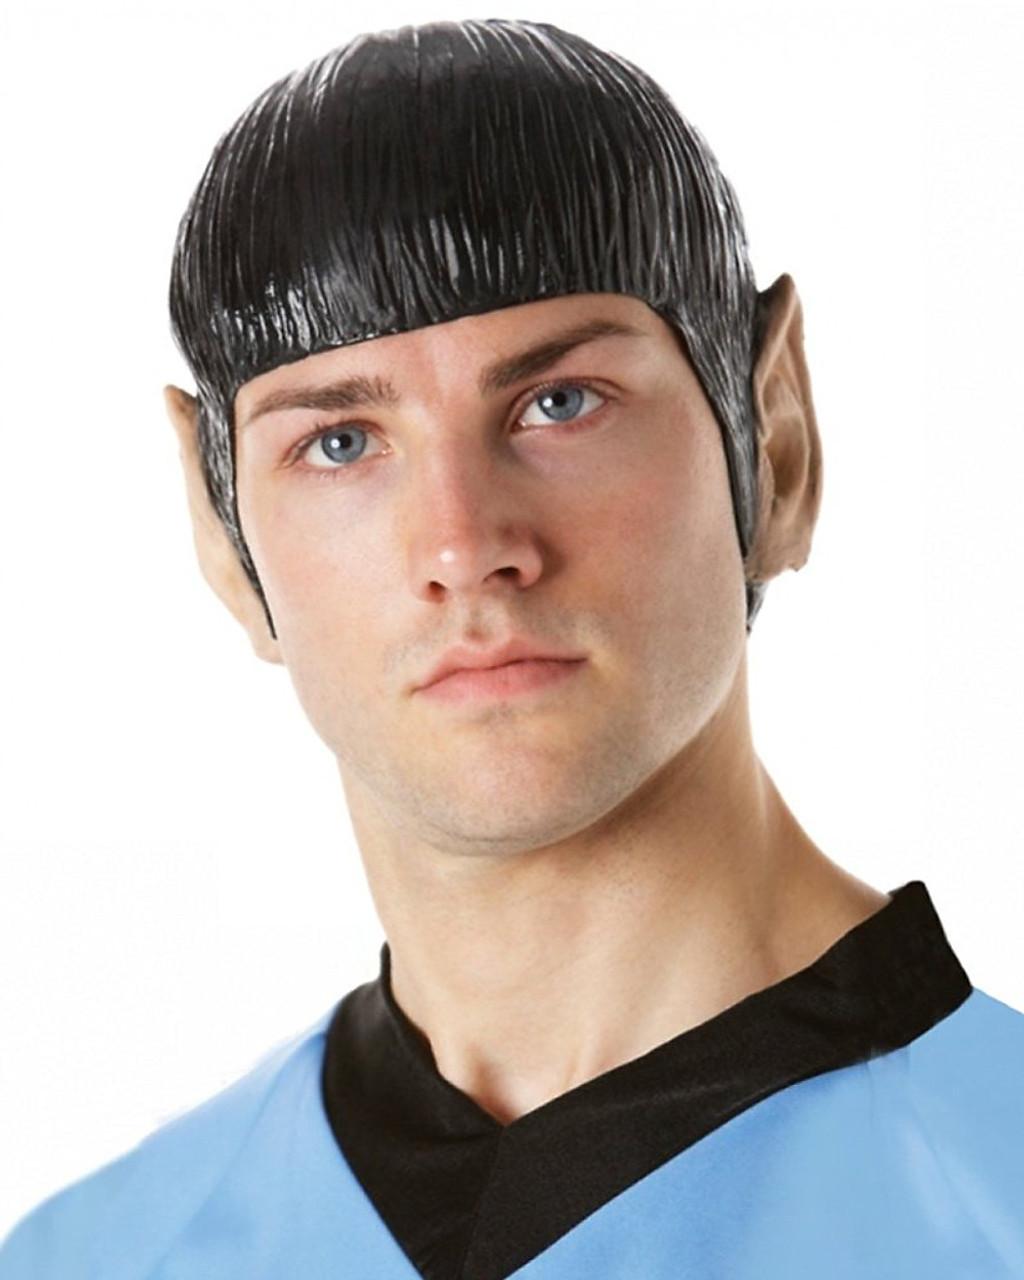 New Star Trek Spock Costume Accessory Vulcan Pointed Elf Ears